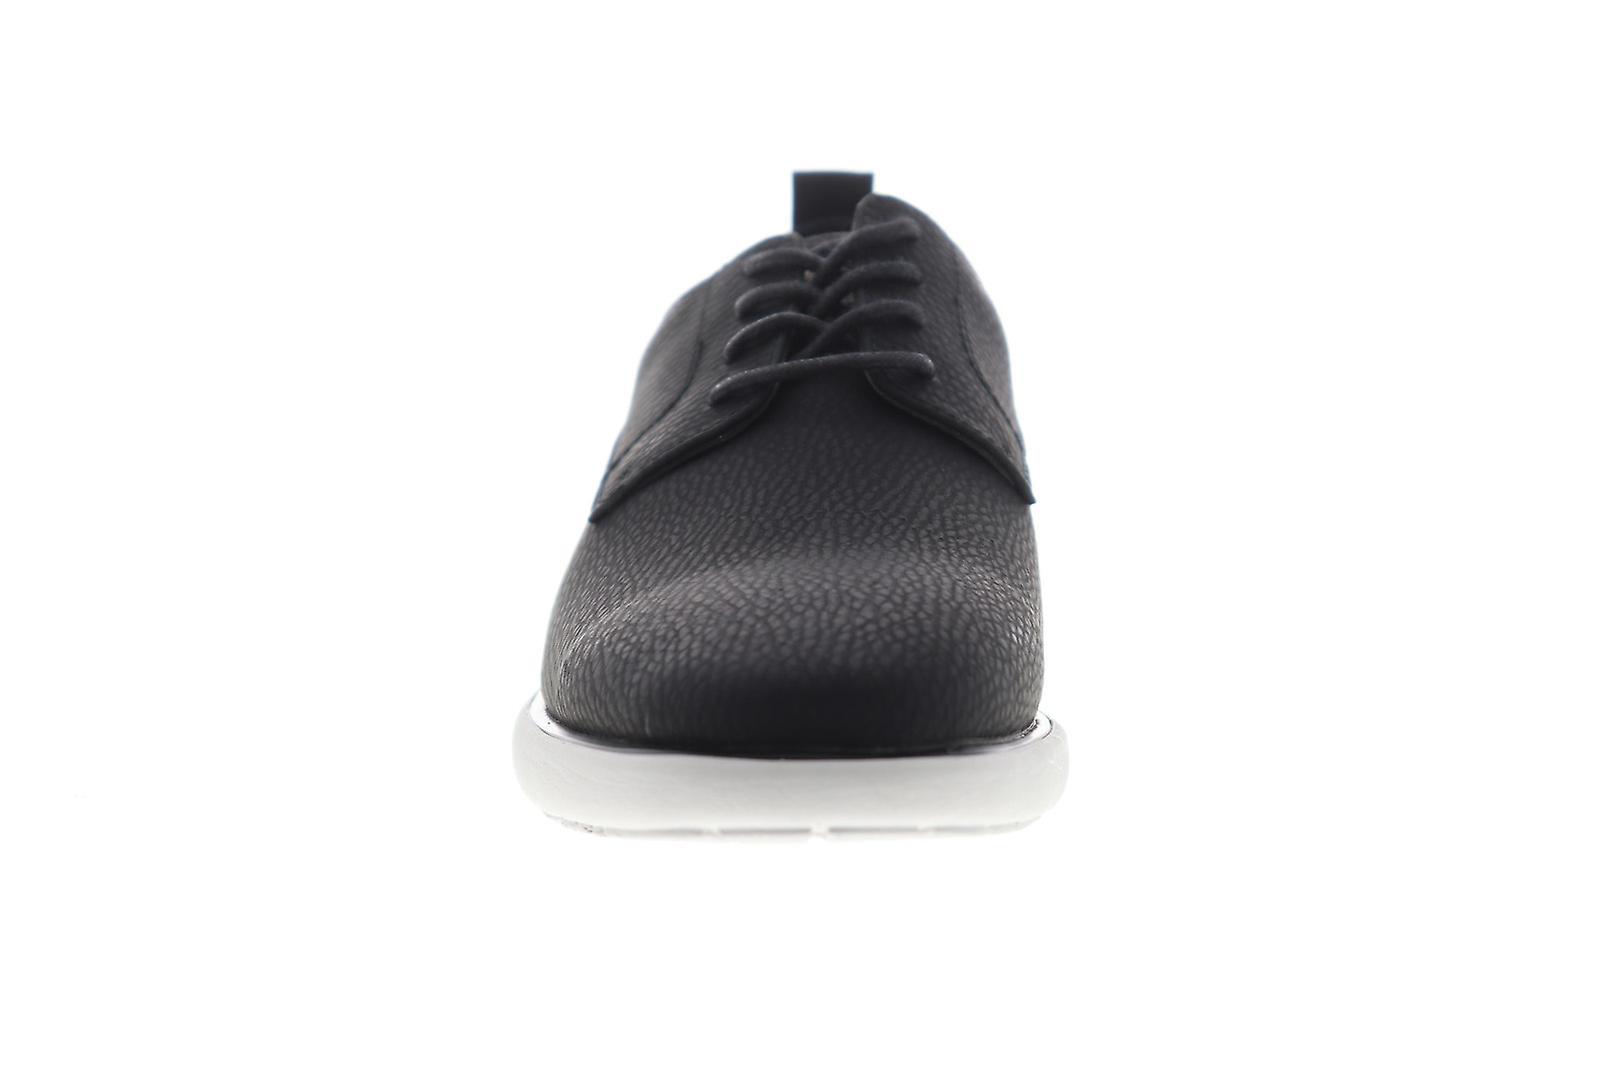 G.H. Bass Duncan Tumbled Mens Black Casual Lace Up Oxfords Shoes - Remise particulière